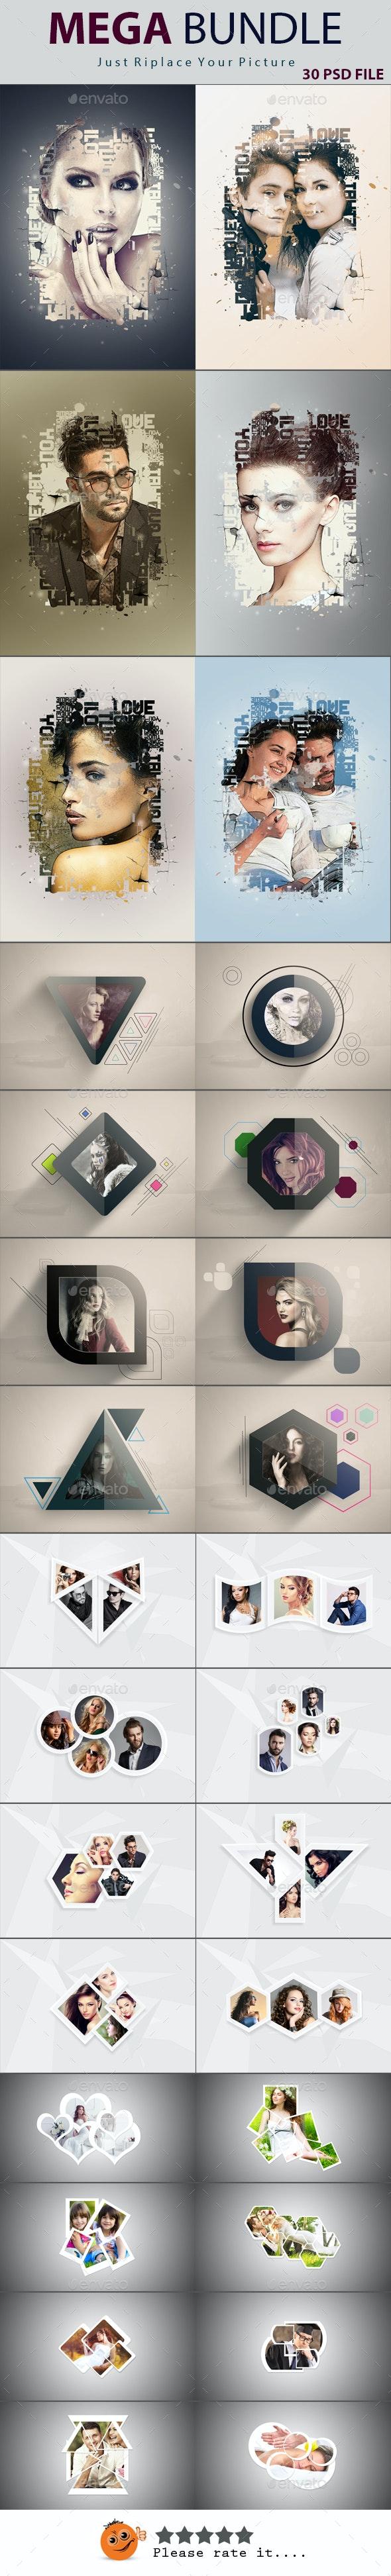 Mega Bundle - Photo Templates Graphics